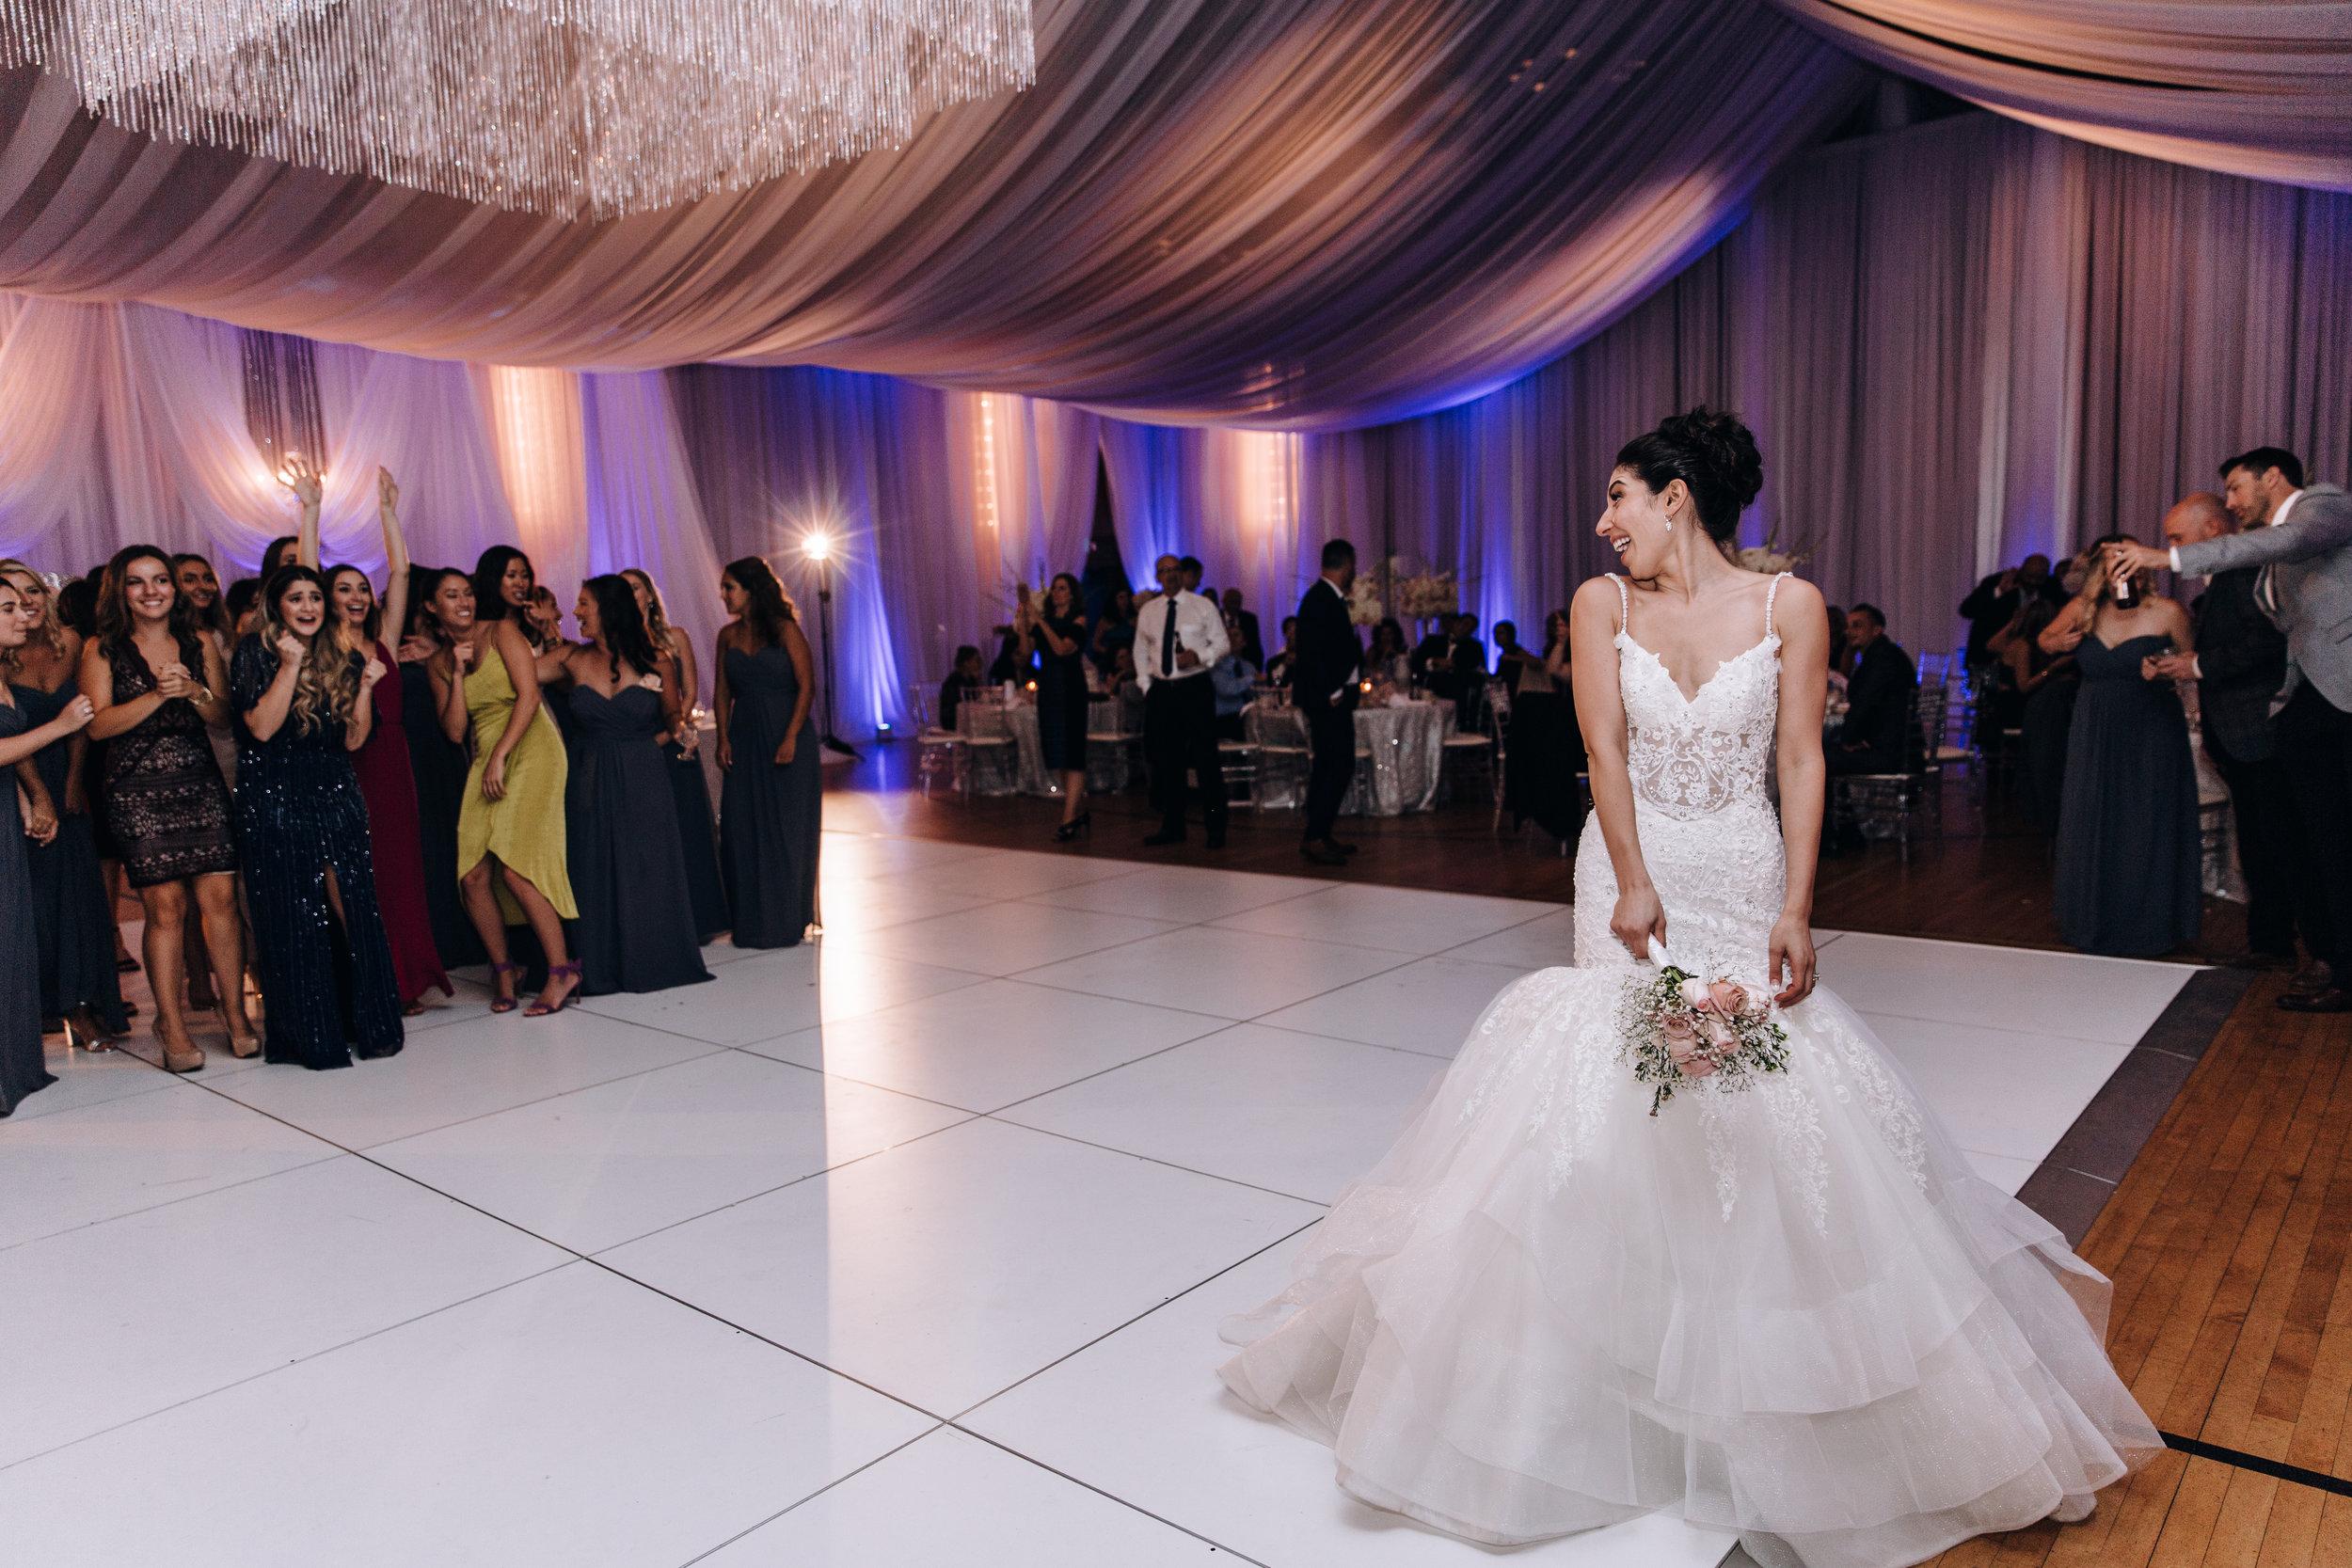 KaraNixonWeddings-GreekOrthodox-Oakland-Wedding-62.jpg